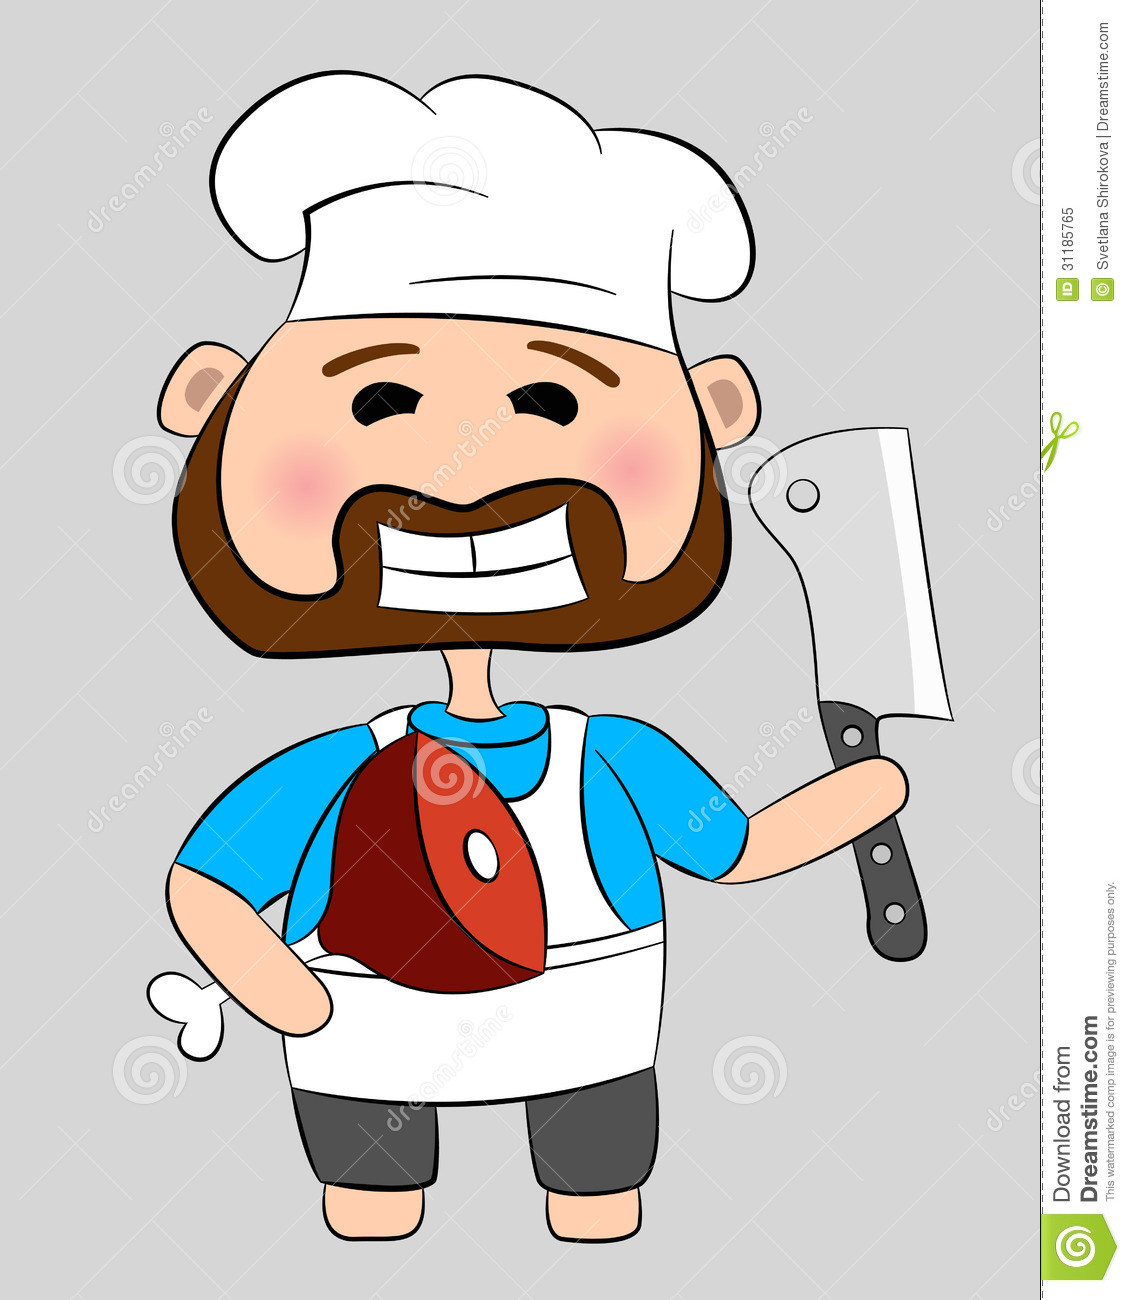 Cartoon butcher clipart.